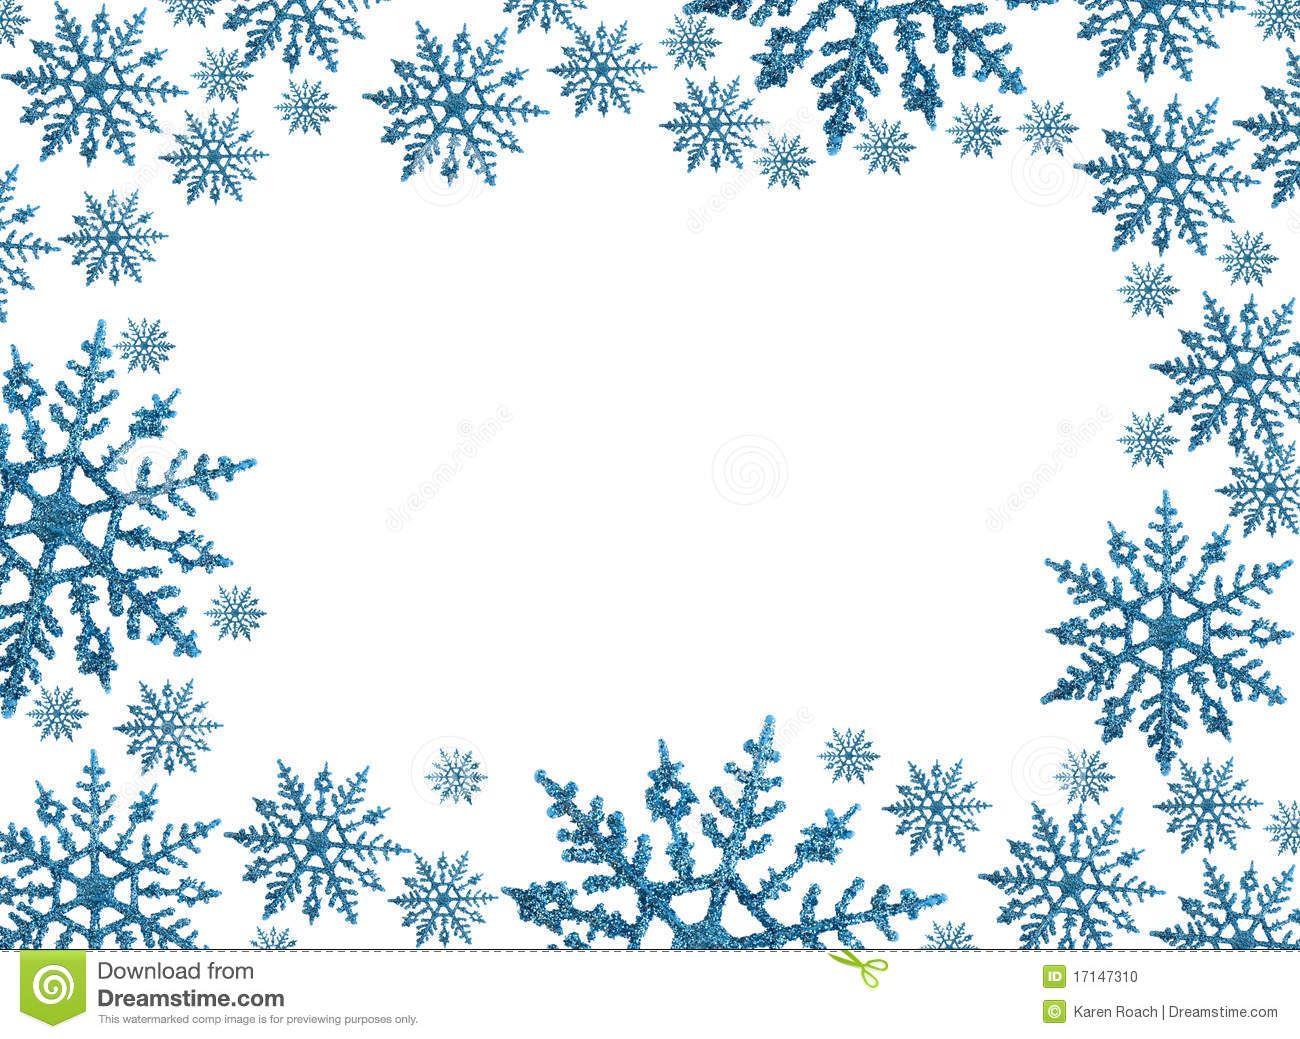 vector library download Snowflake borders clipart. Circle border clip art